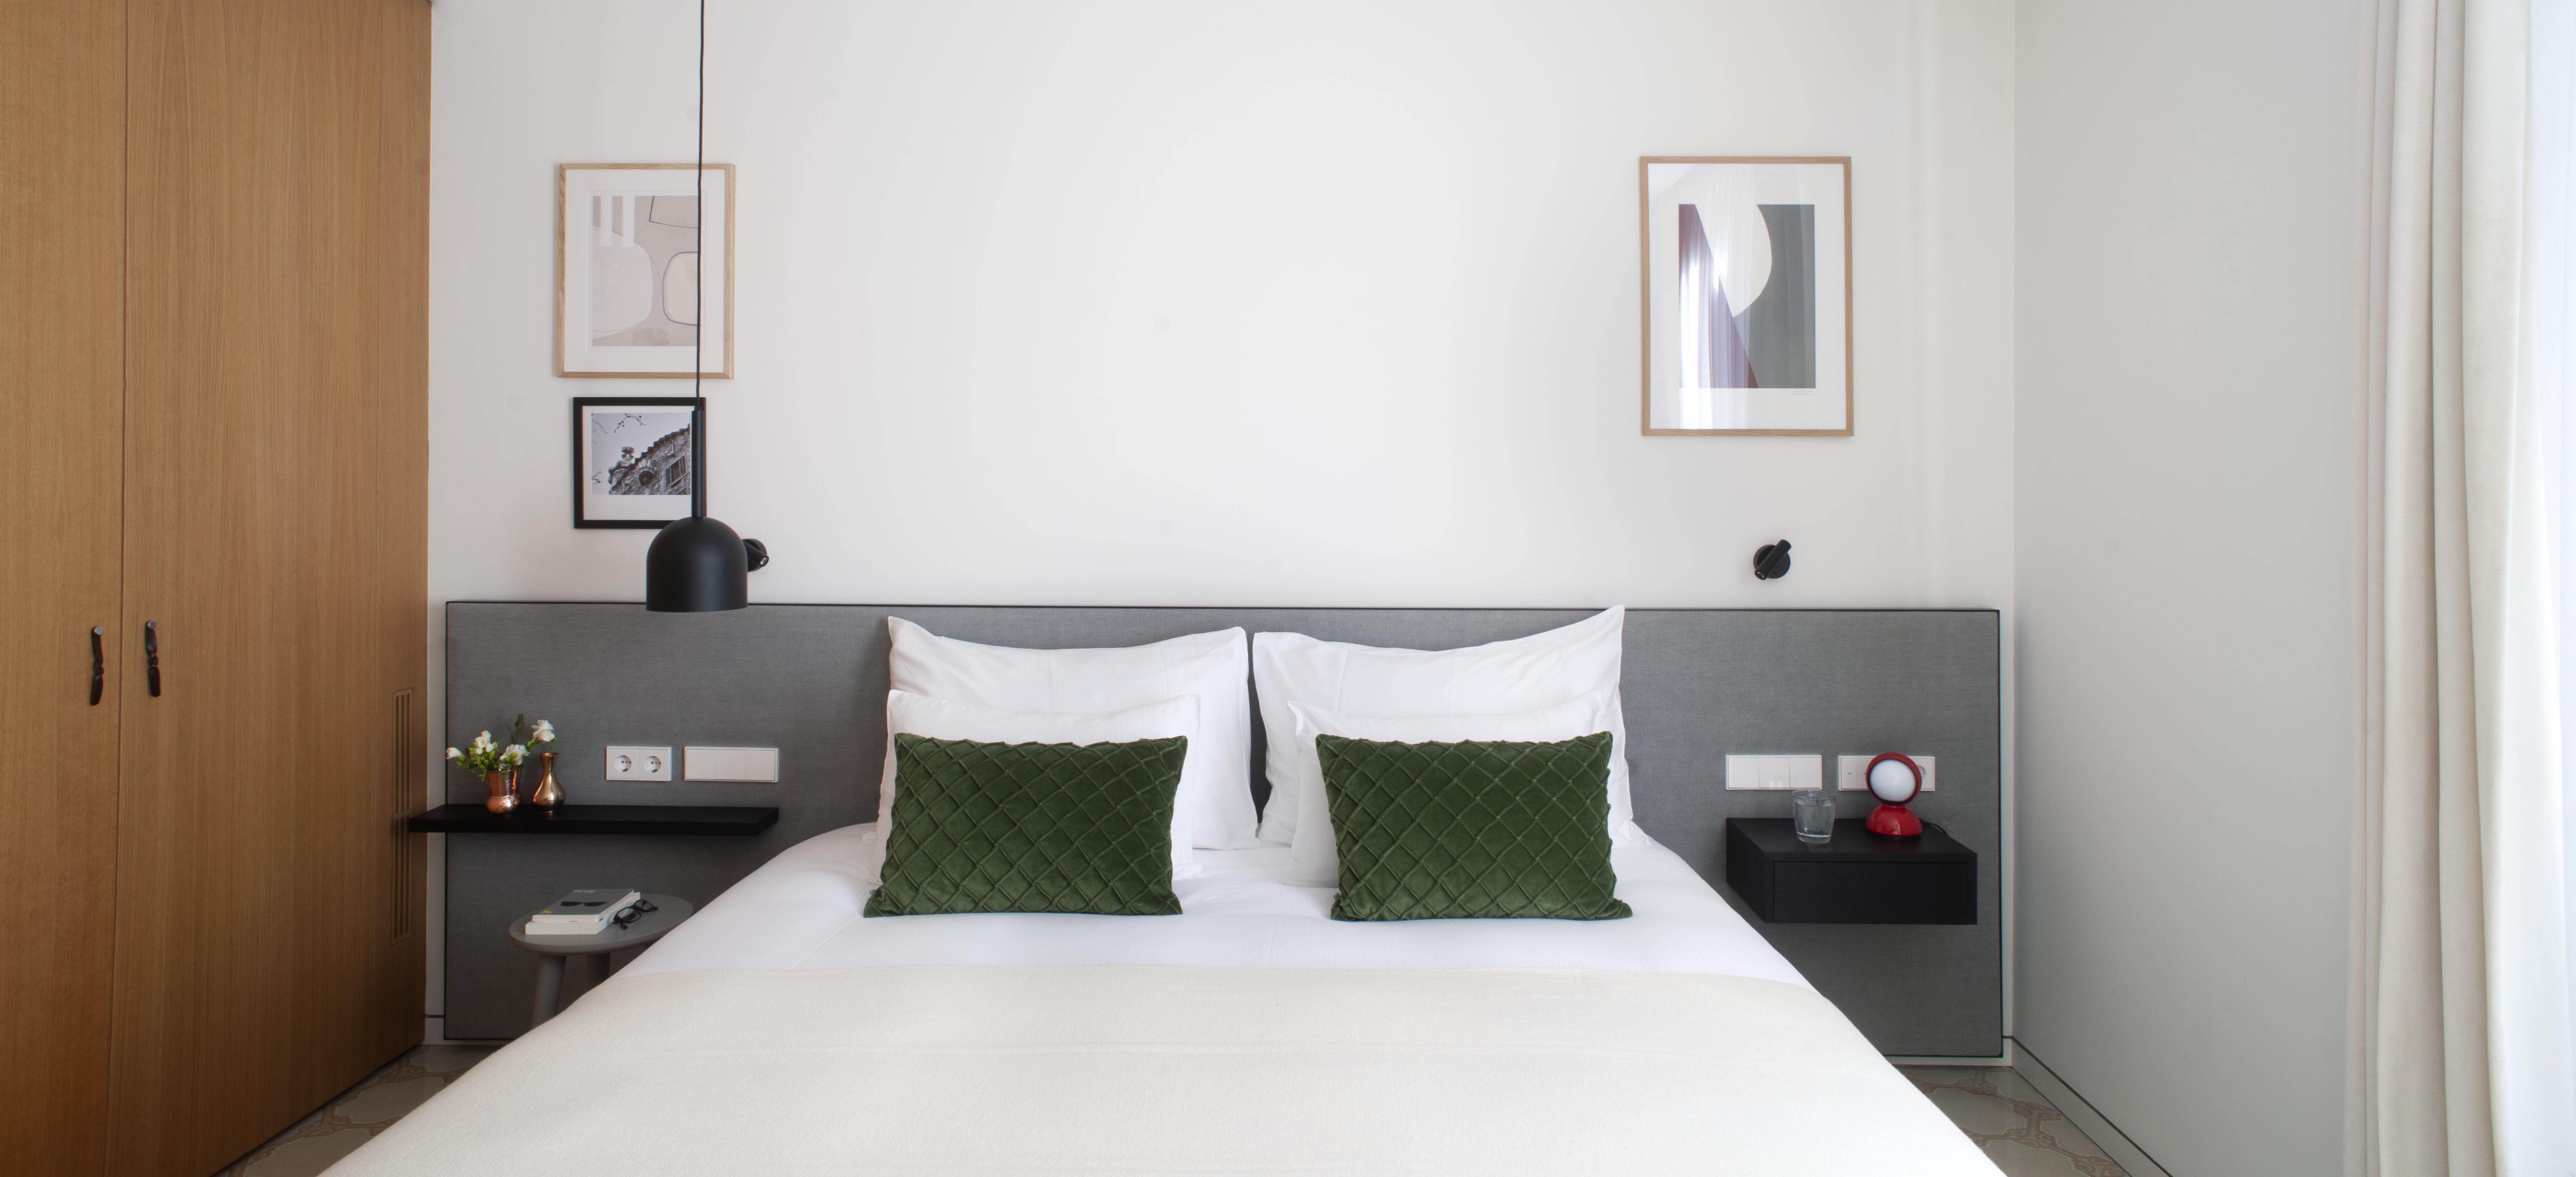 Apartment Luxury Apartment 4 bedrooms 4  1   photo 23315961